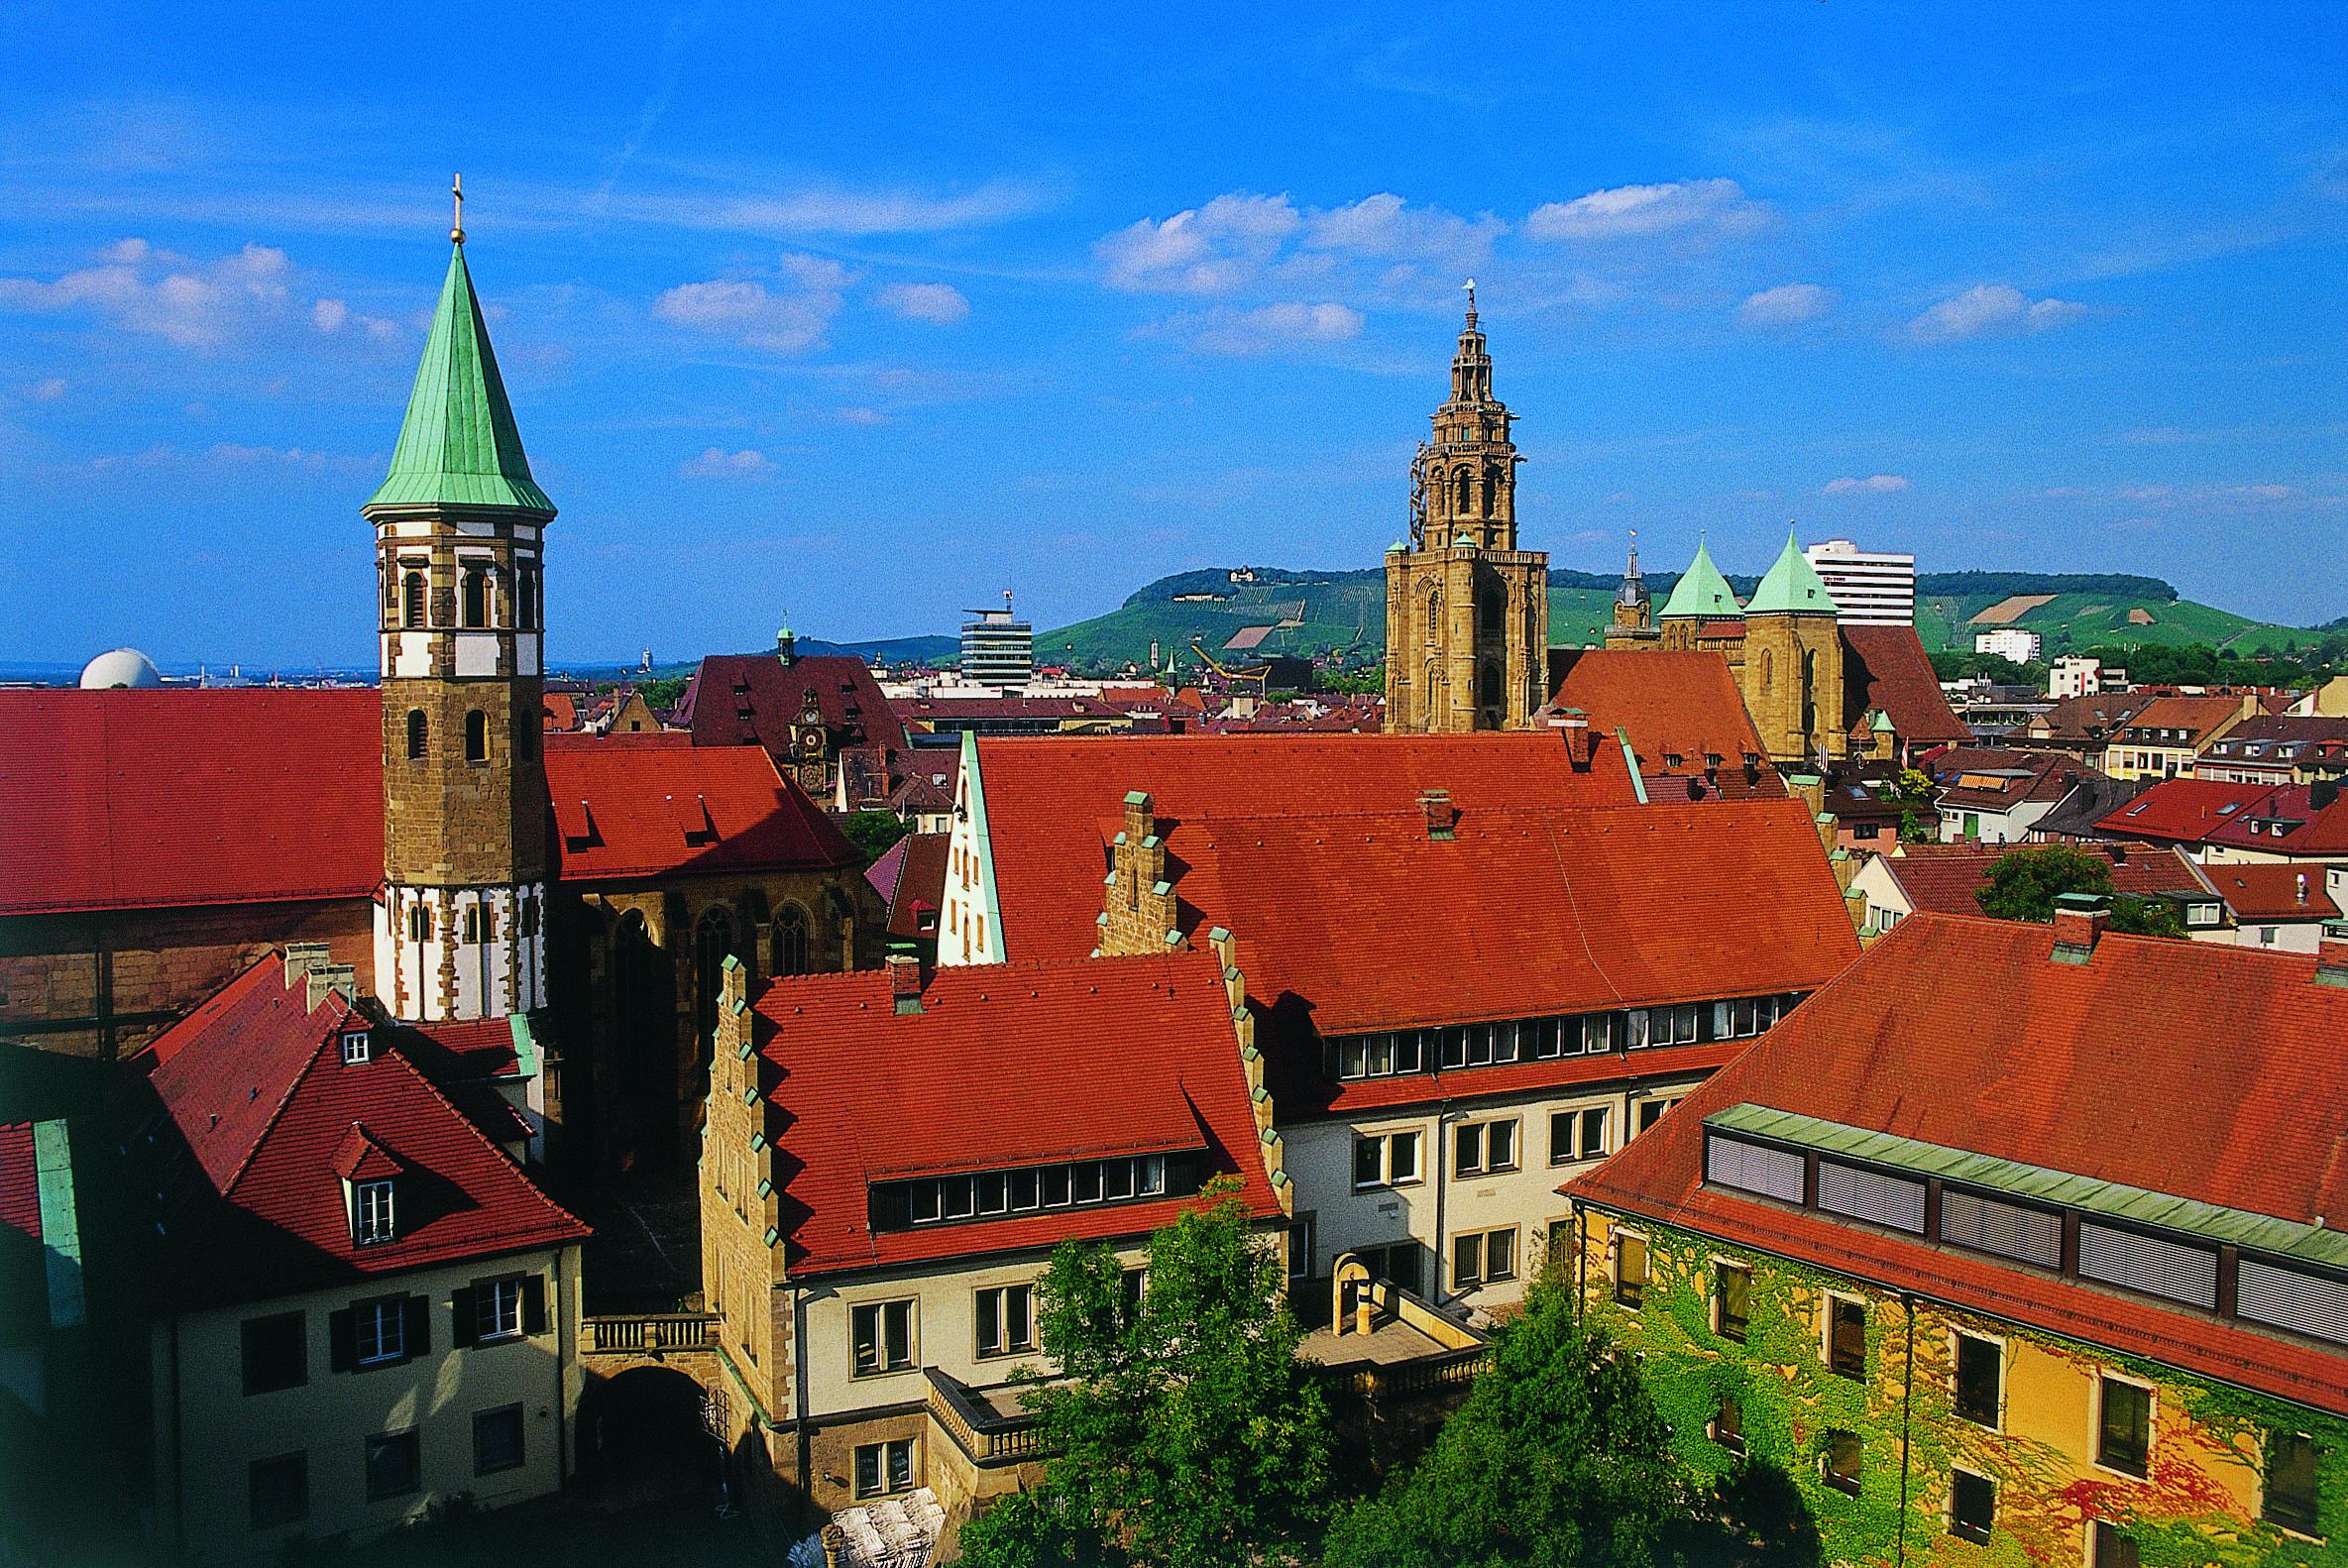 Bild: Stadt Heilbronn